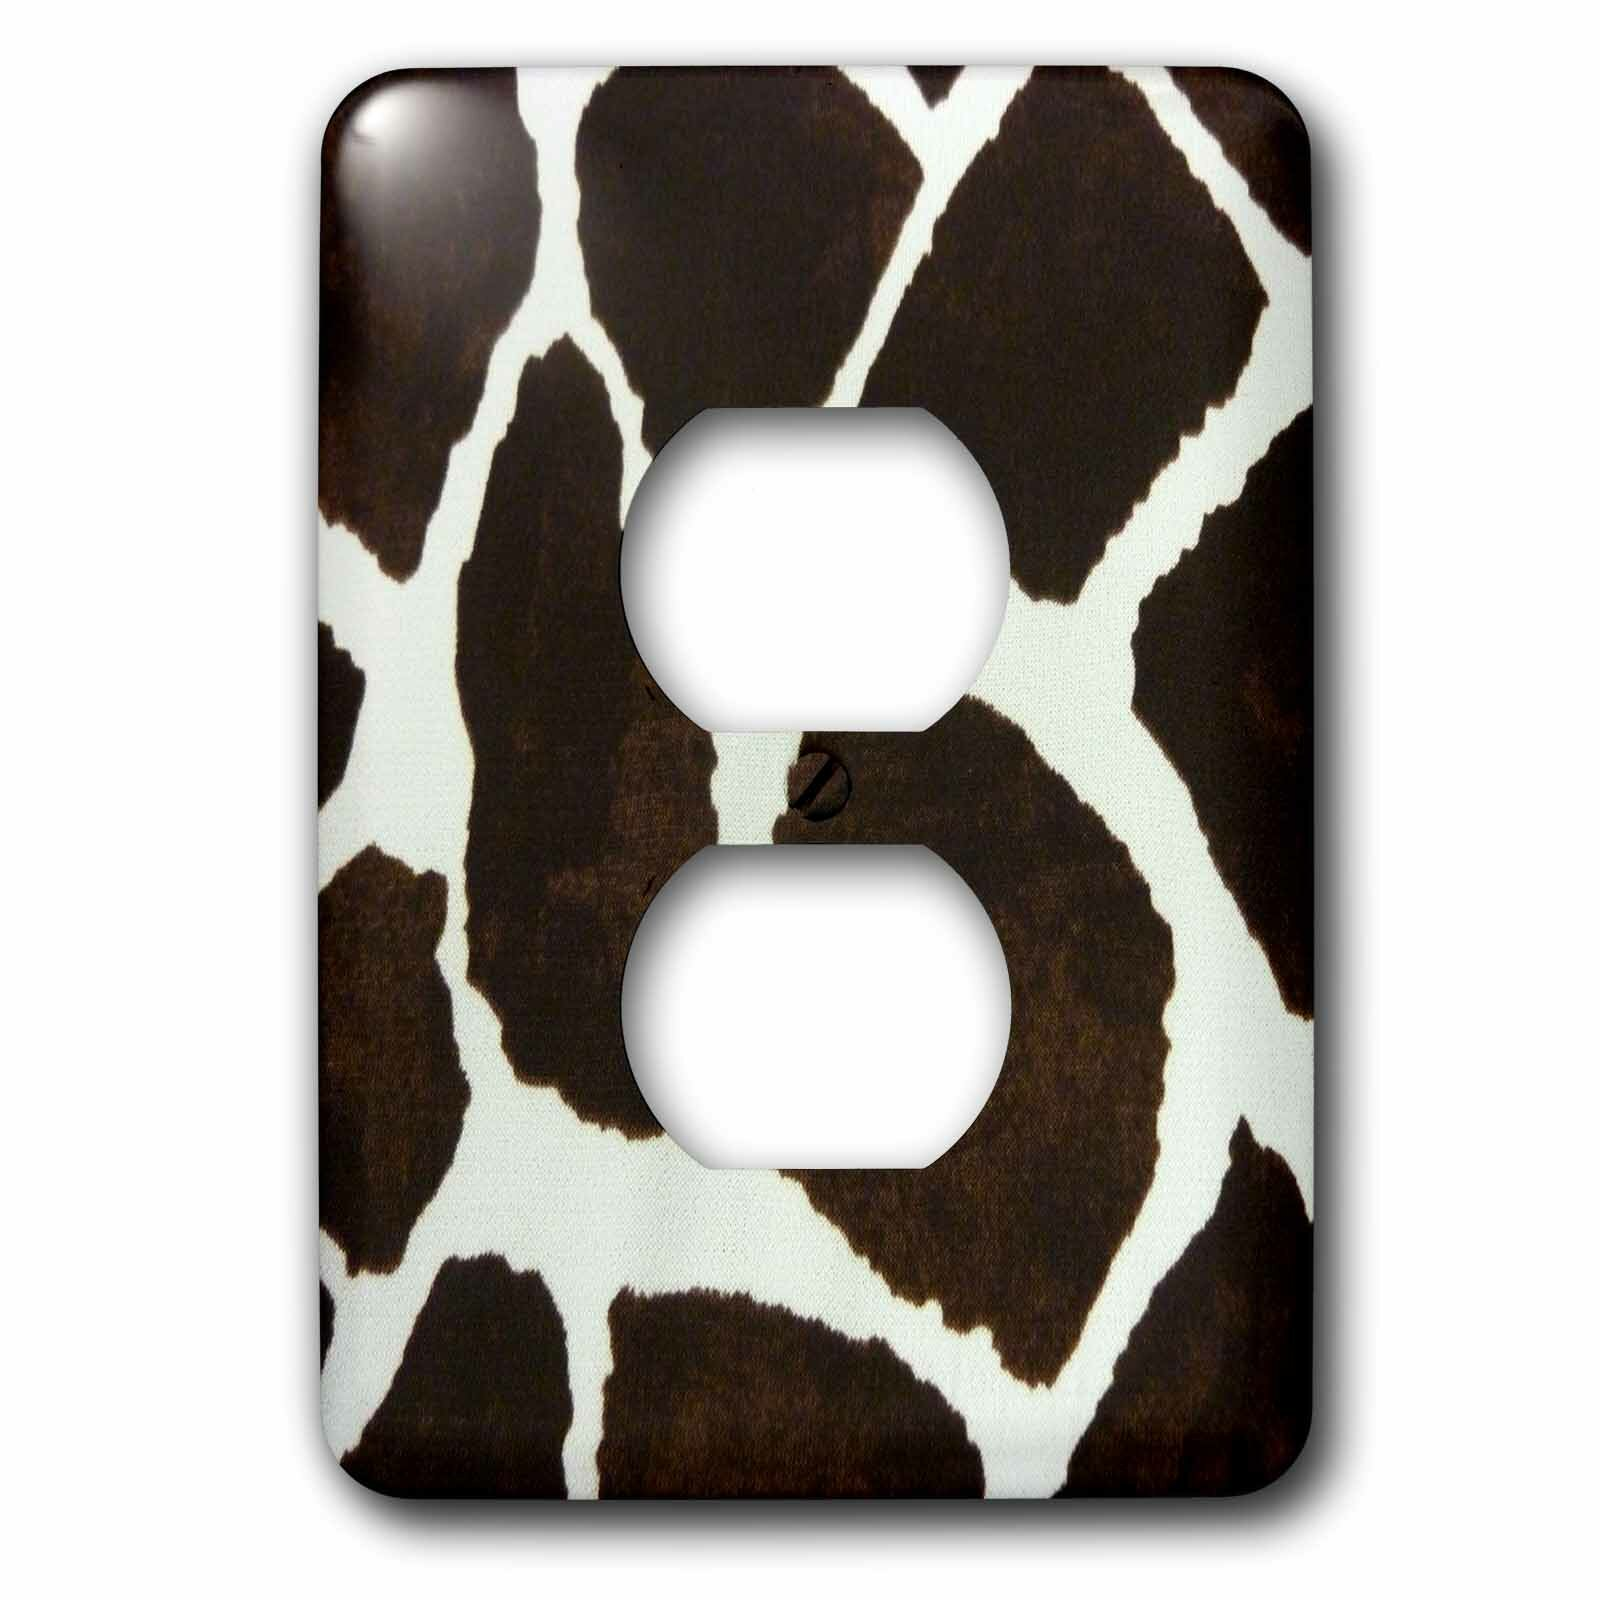 3drose And Cow Print 1 Gang Duplex Outlet Wall Plate Wayfair